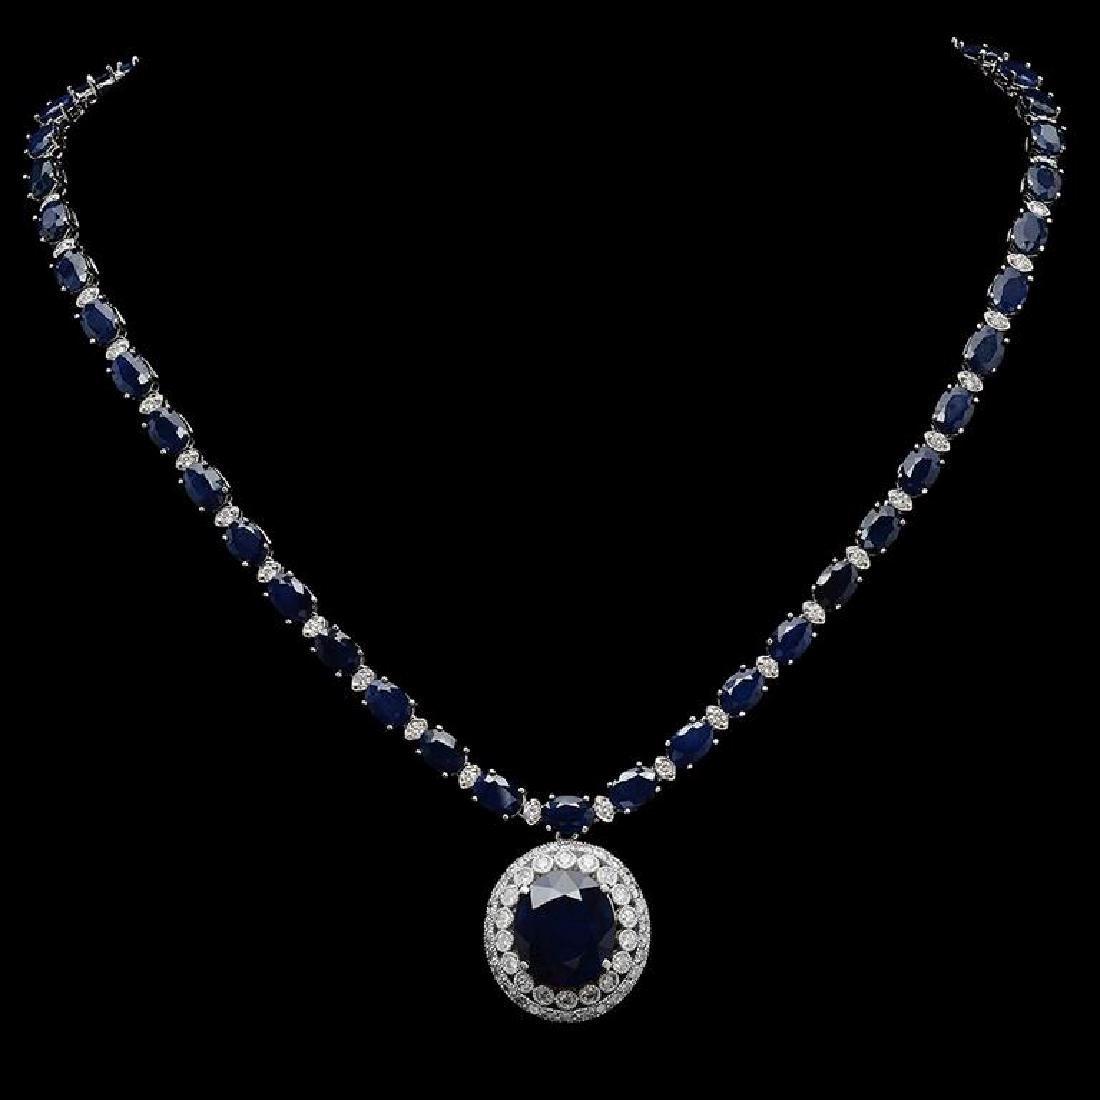 14K Gold 50.77 ct Sapphire & 3.27 ct Diamond Necklace